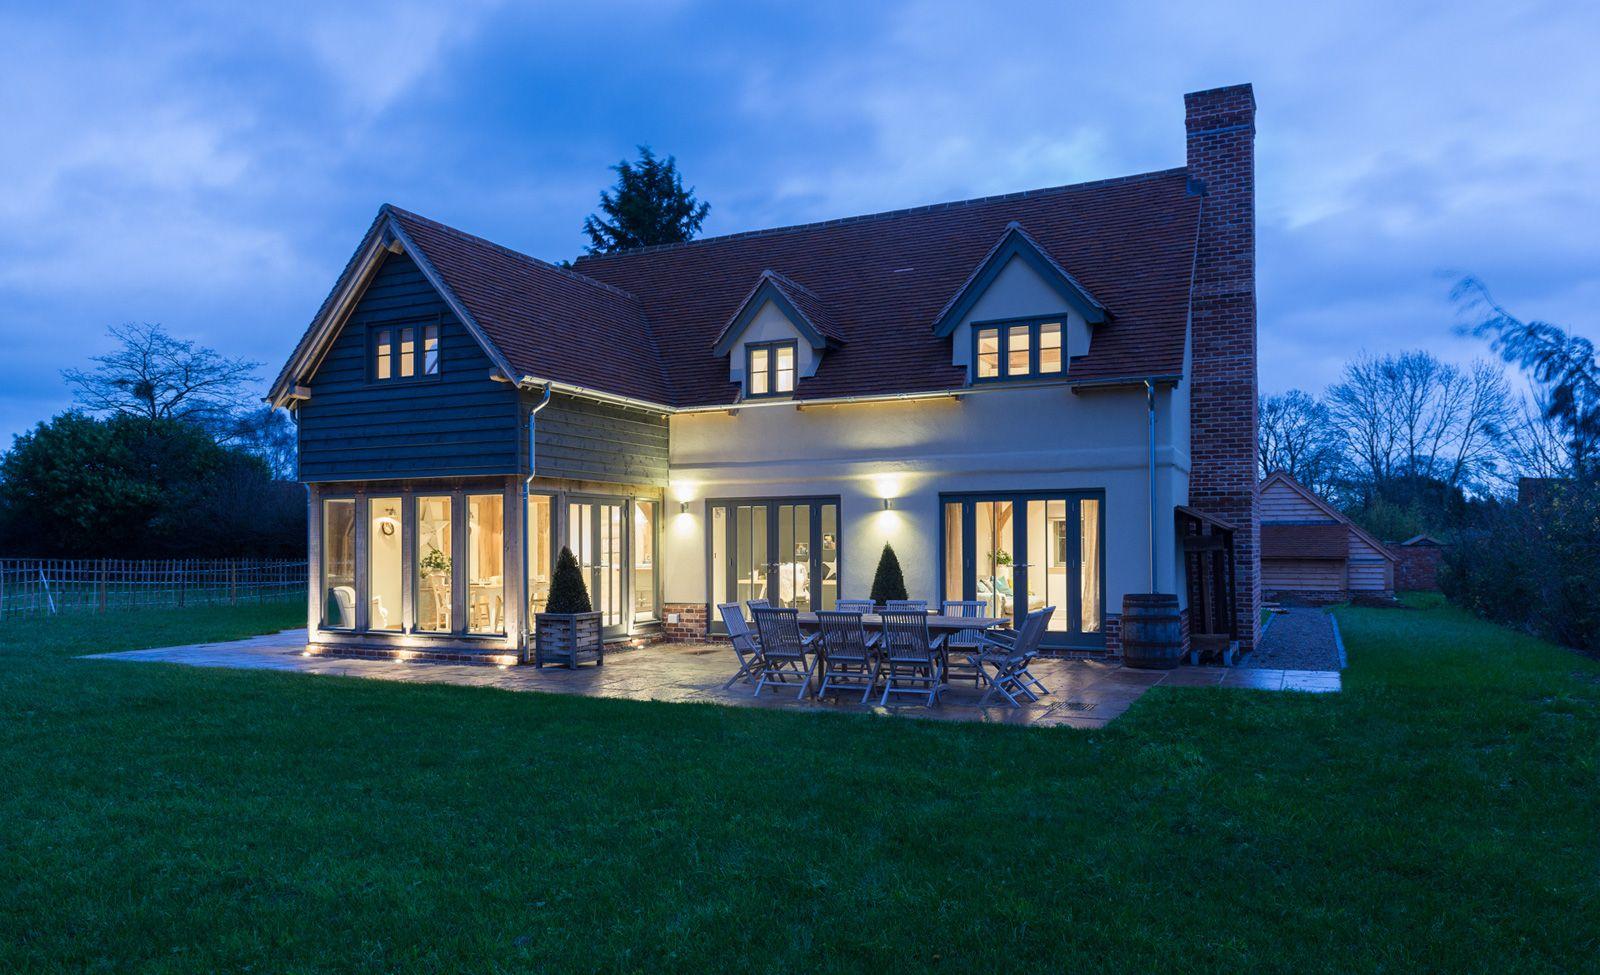 Border Oak Show House At Dusk House Architecture Design Self Build Houses House Styles